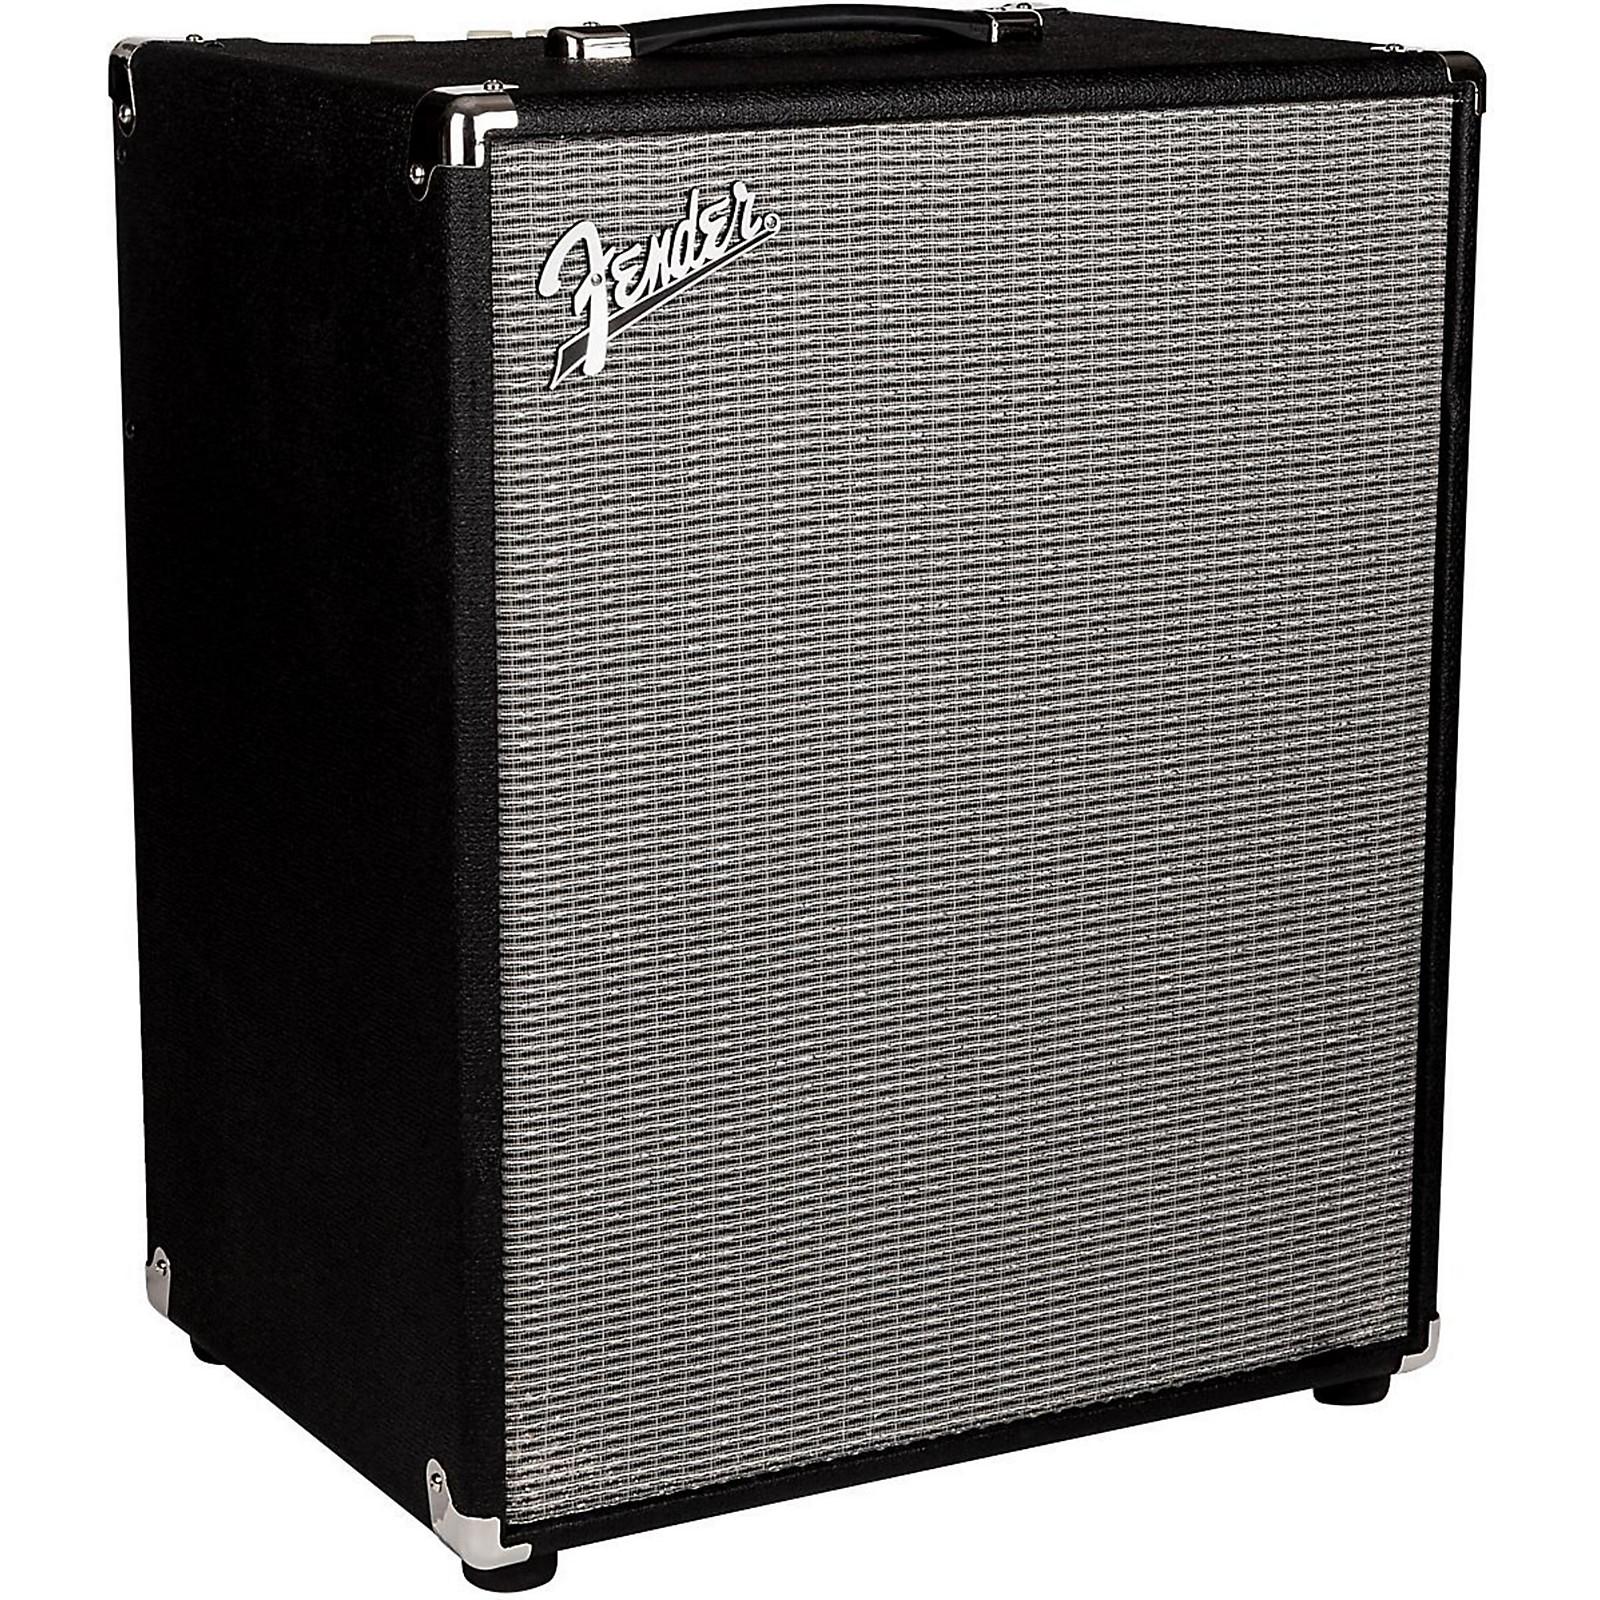 Fender Rumble 500 2x10 500W Bass Combo Amp